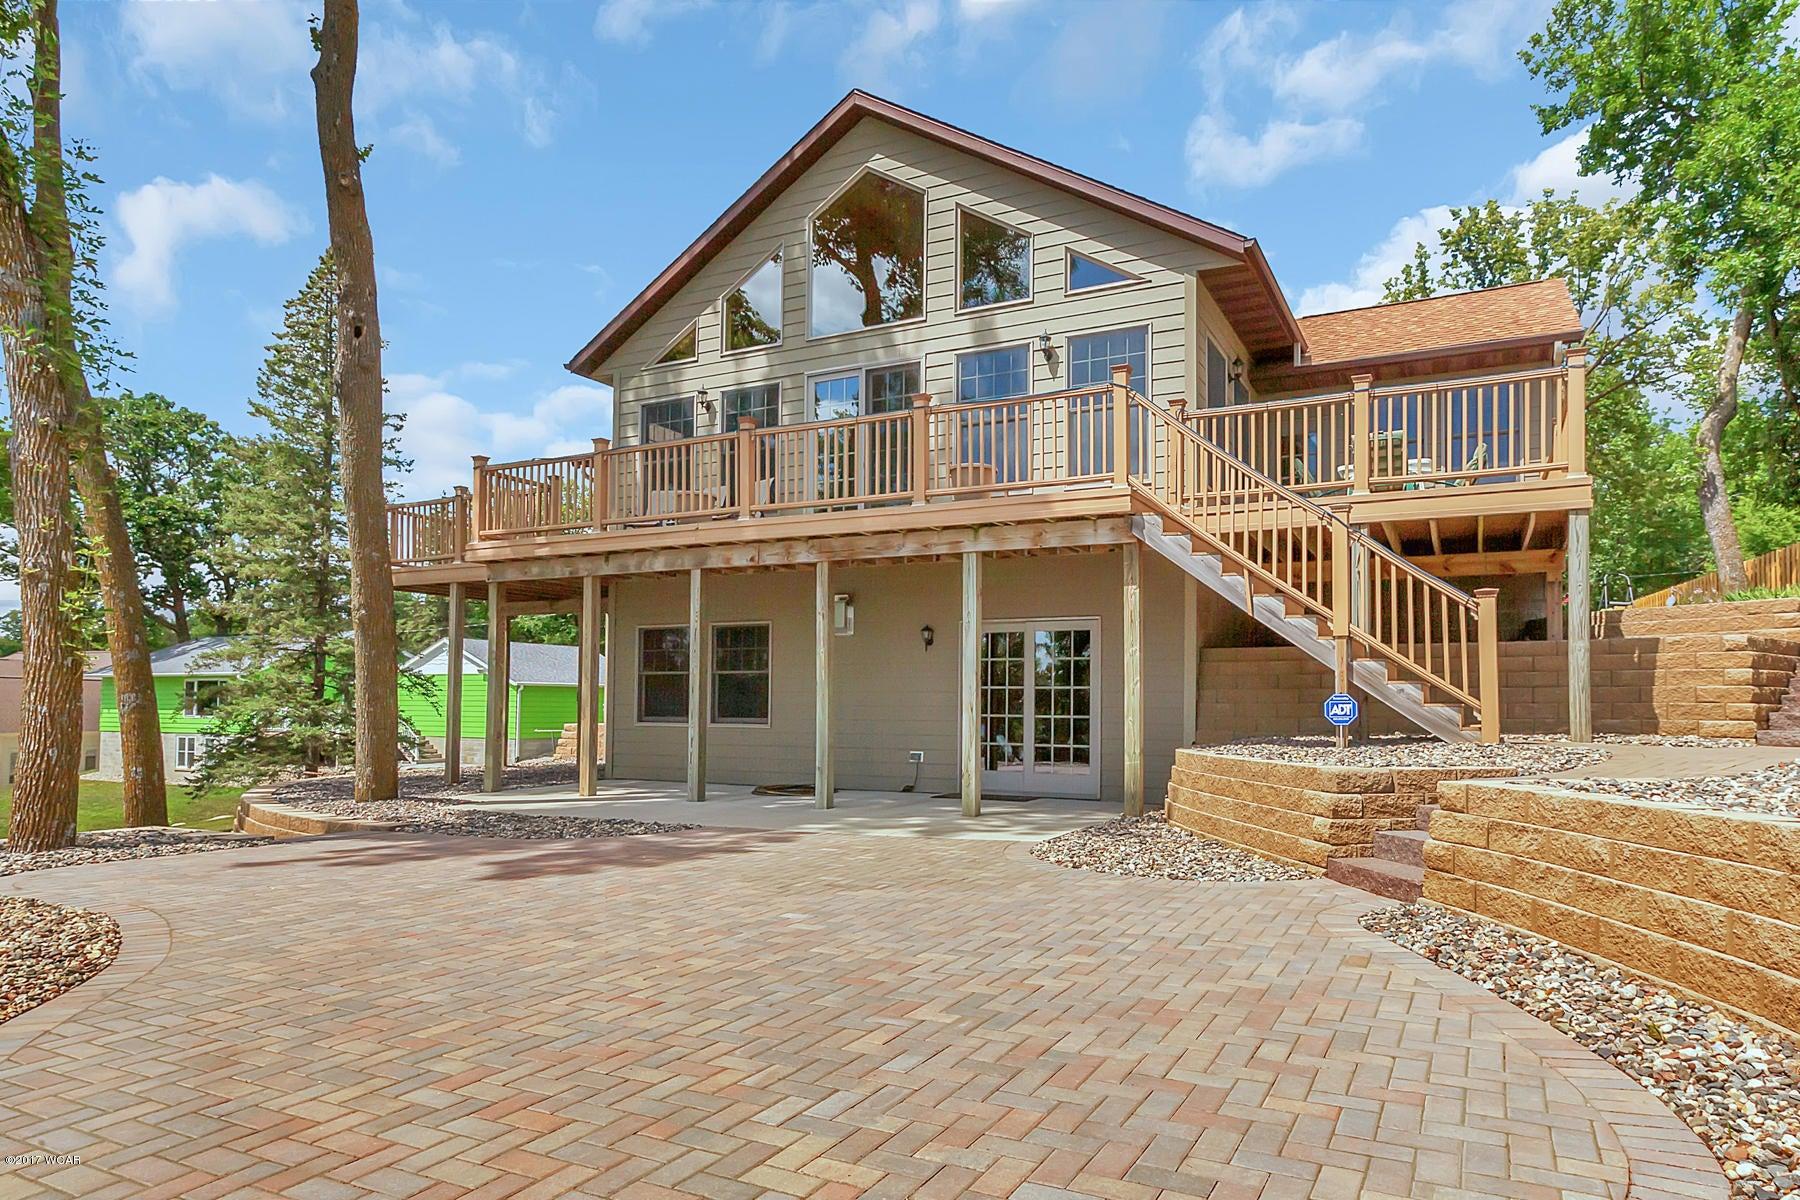 29149 Lake Avenue,Paynesville,4 Bedrooms Bedrooms,3 BathroomsBathrooms,Single Family,Lake Avenue,6028070